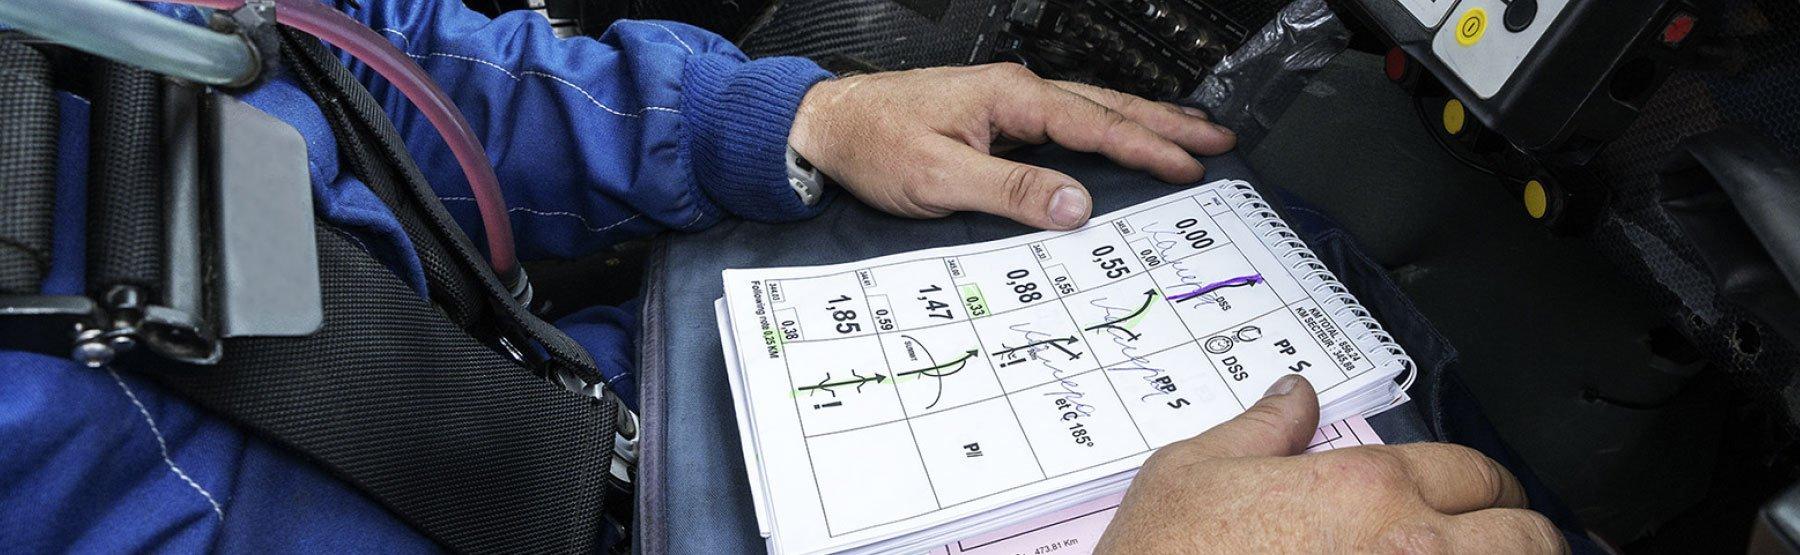 FTS Racing - Prodotti performance per il settore Racing